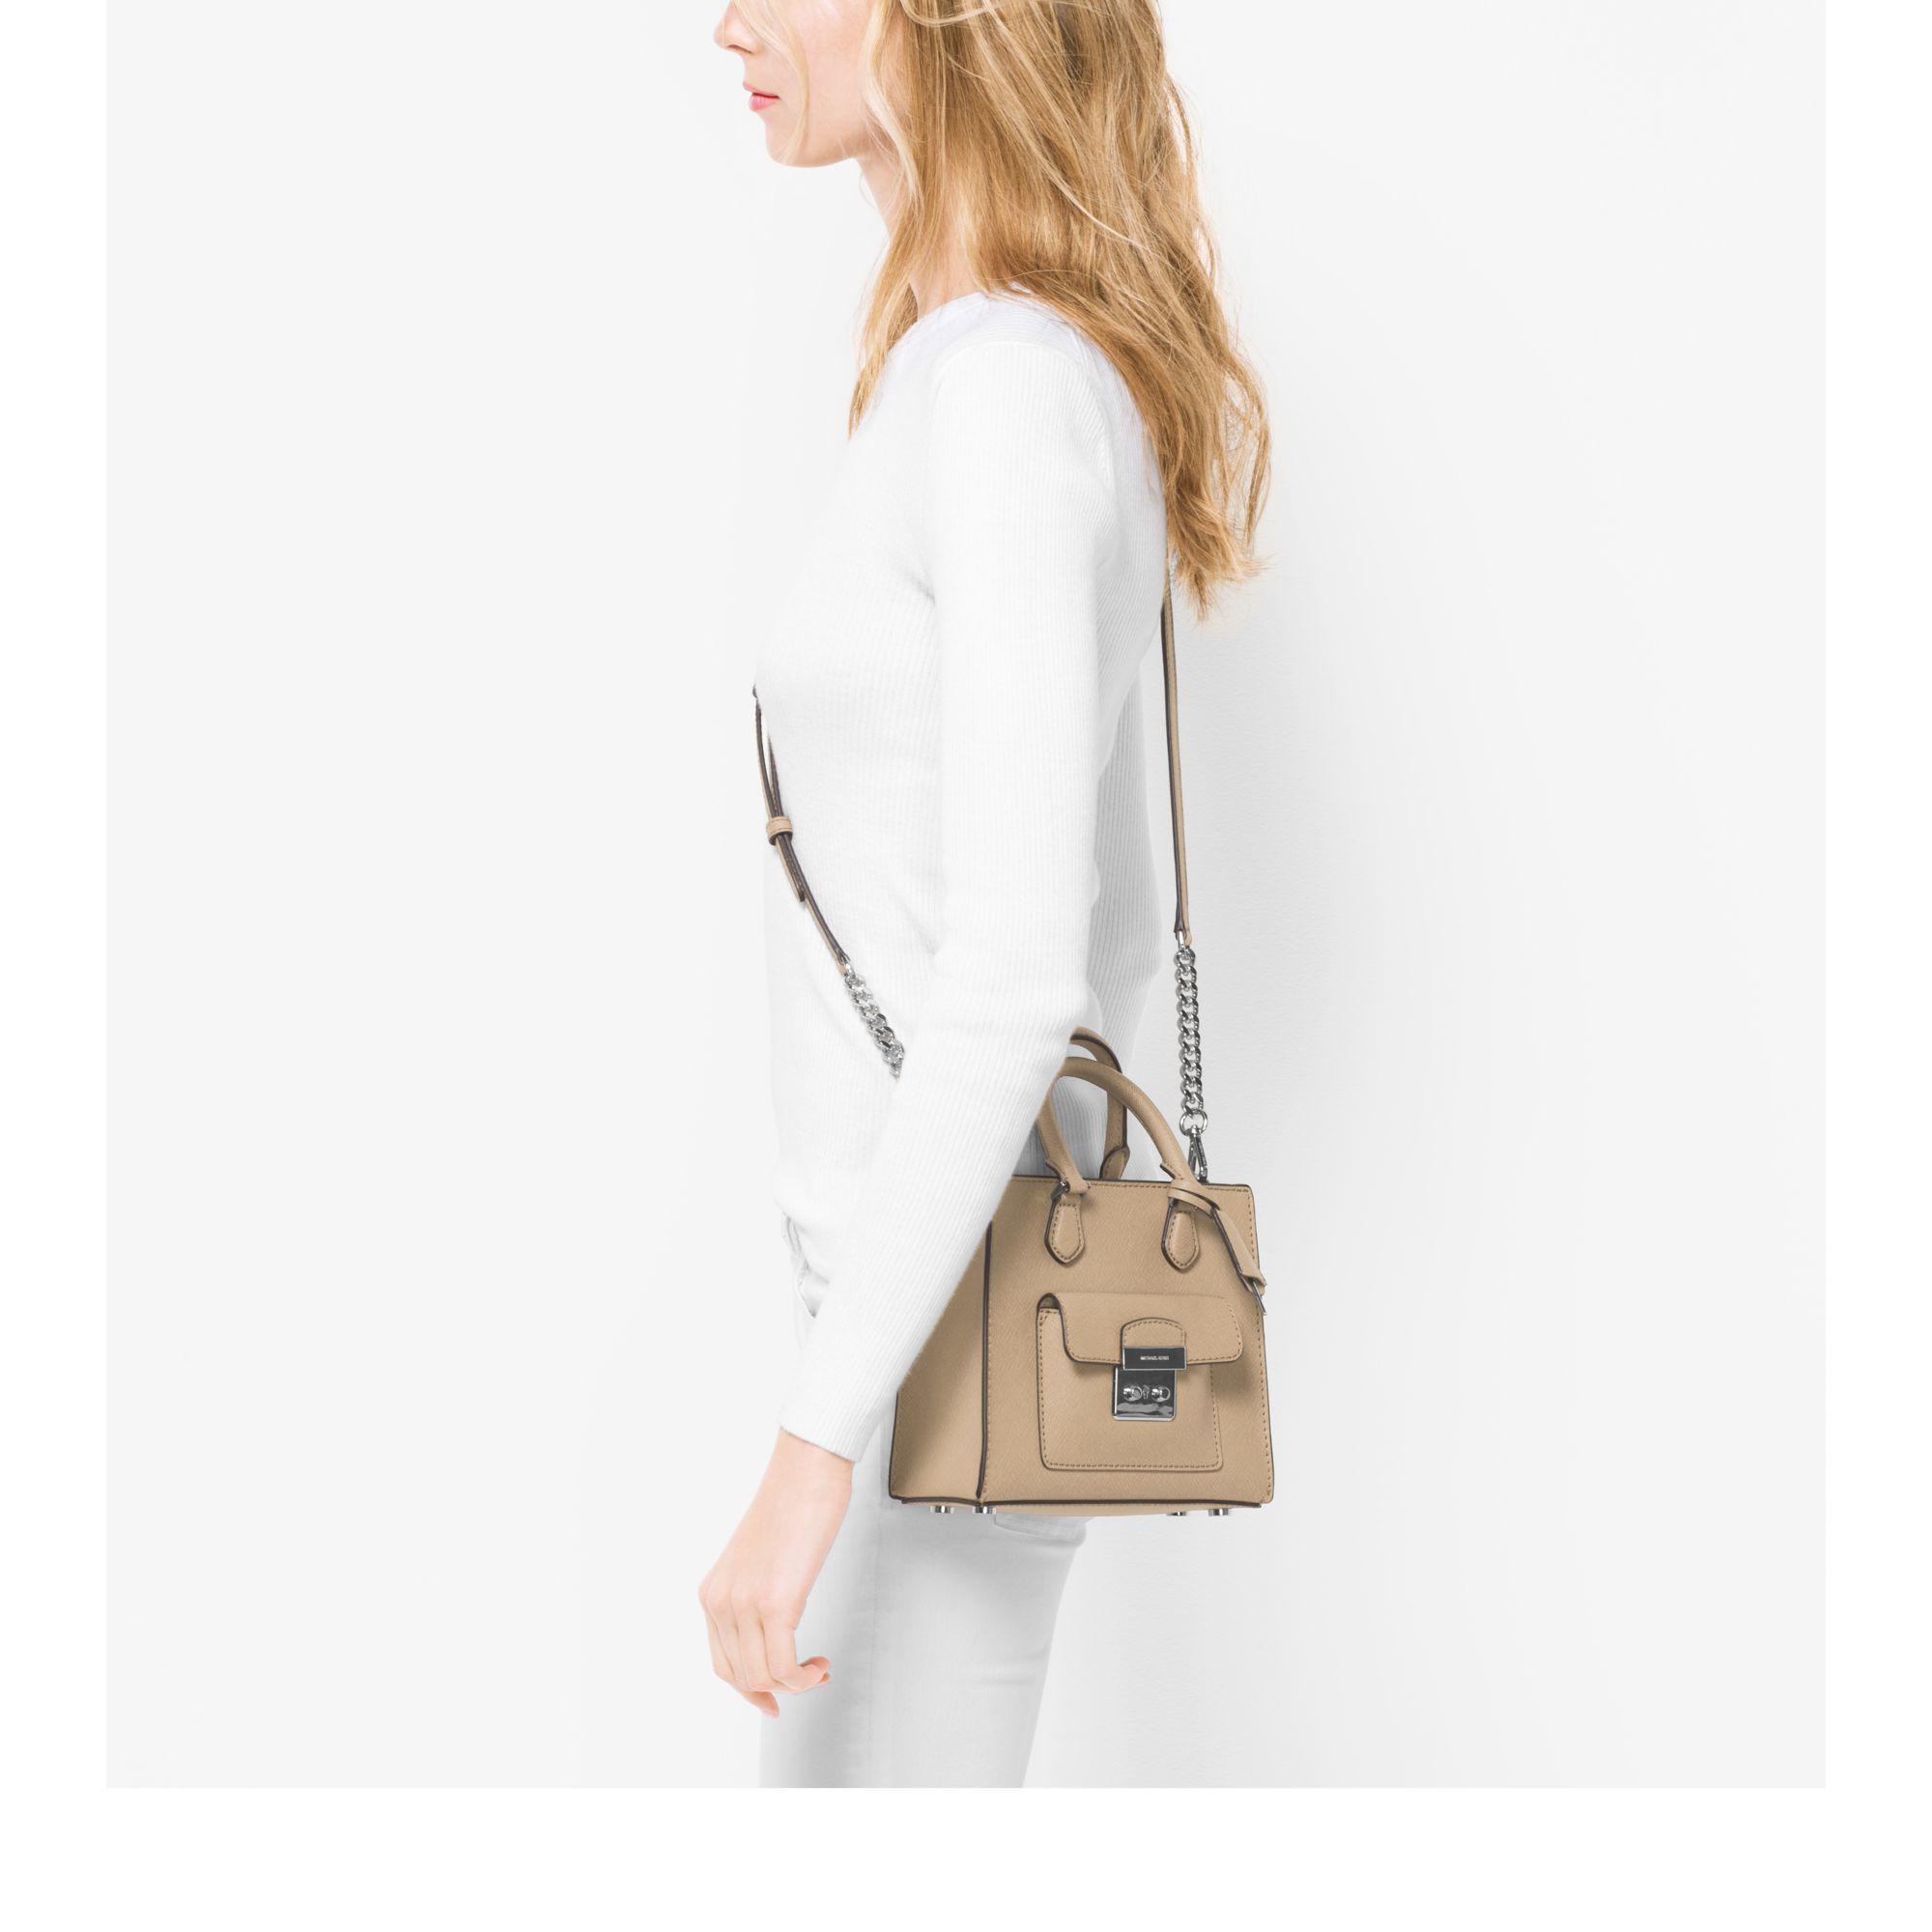 6dd27c88e8ba1d Michael Kors Bridgette Small Saffiano Leather Cross-Body Bag in Natural -  Lyst